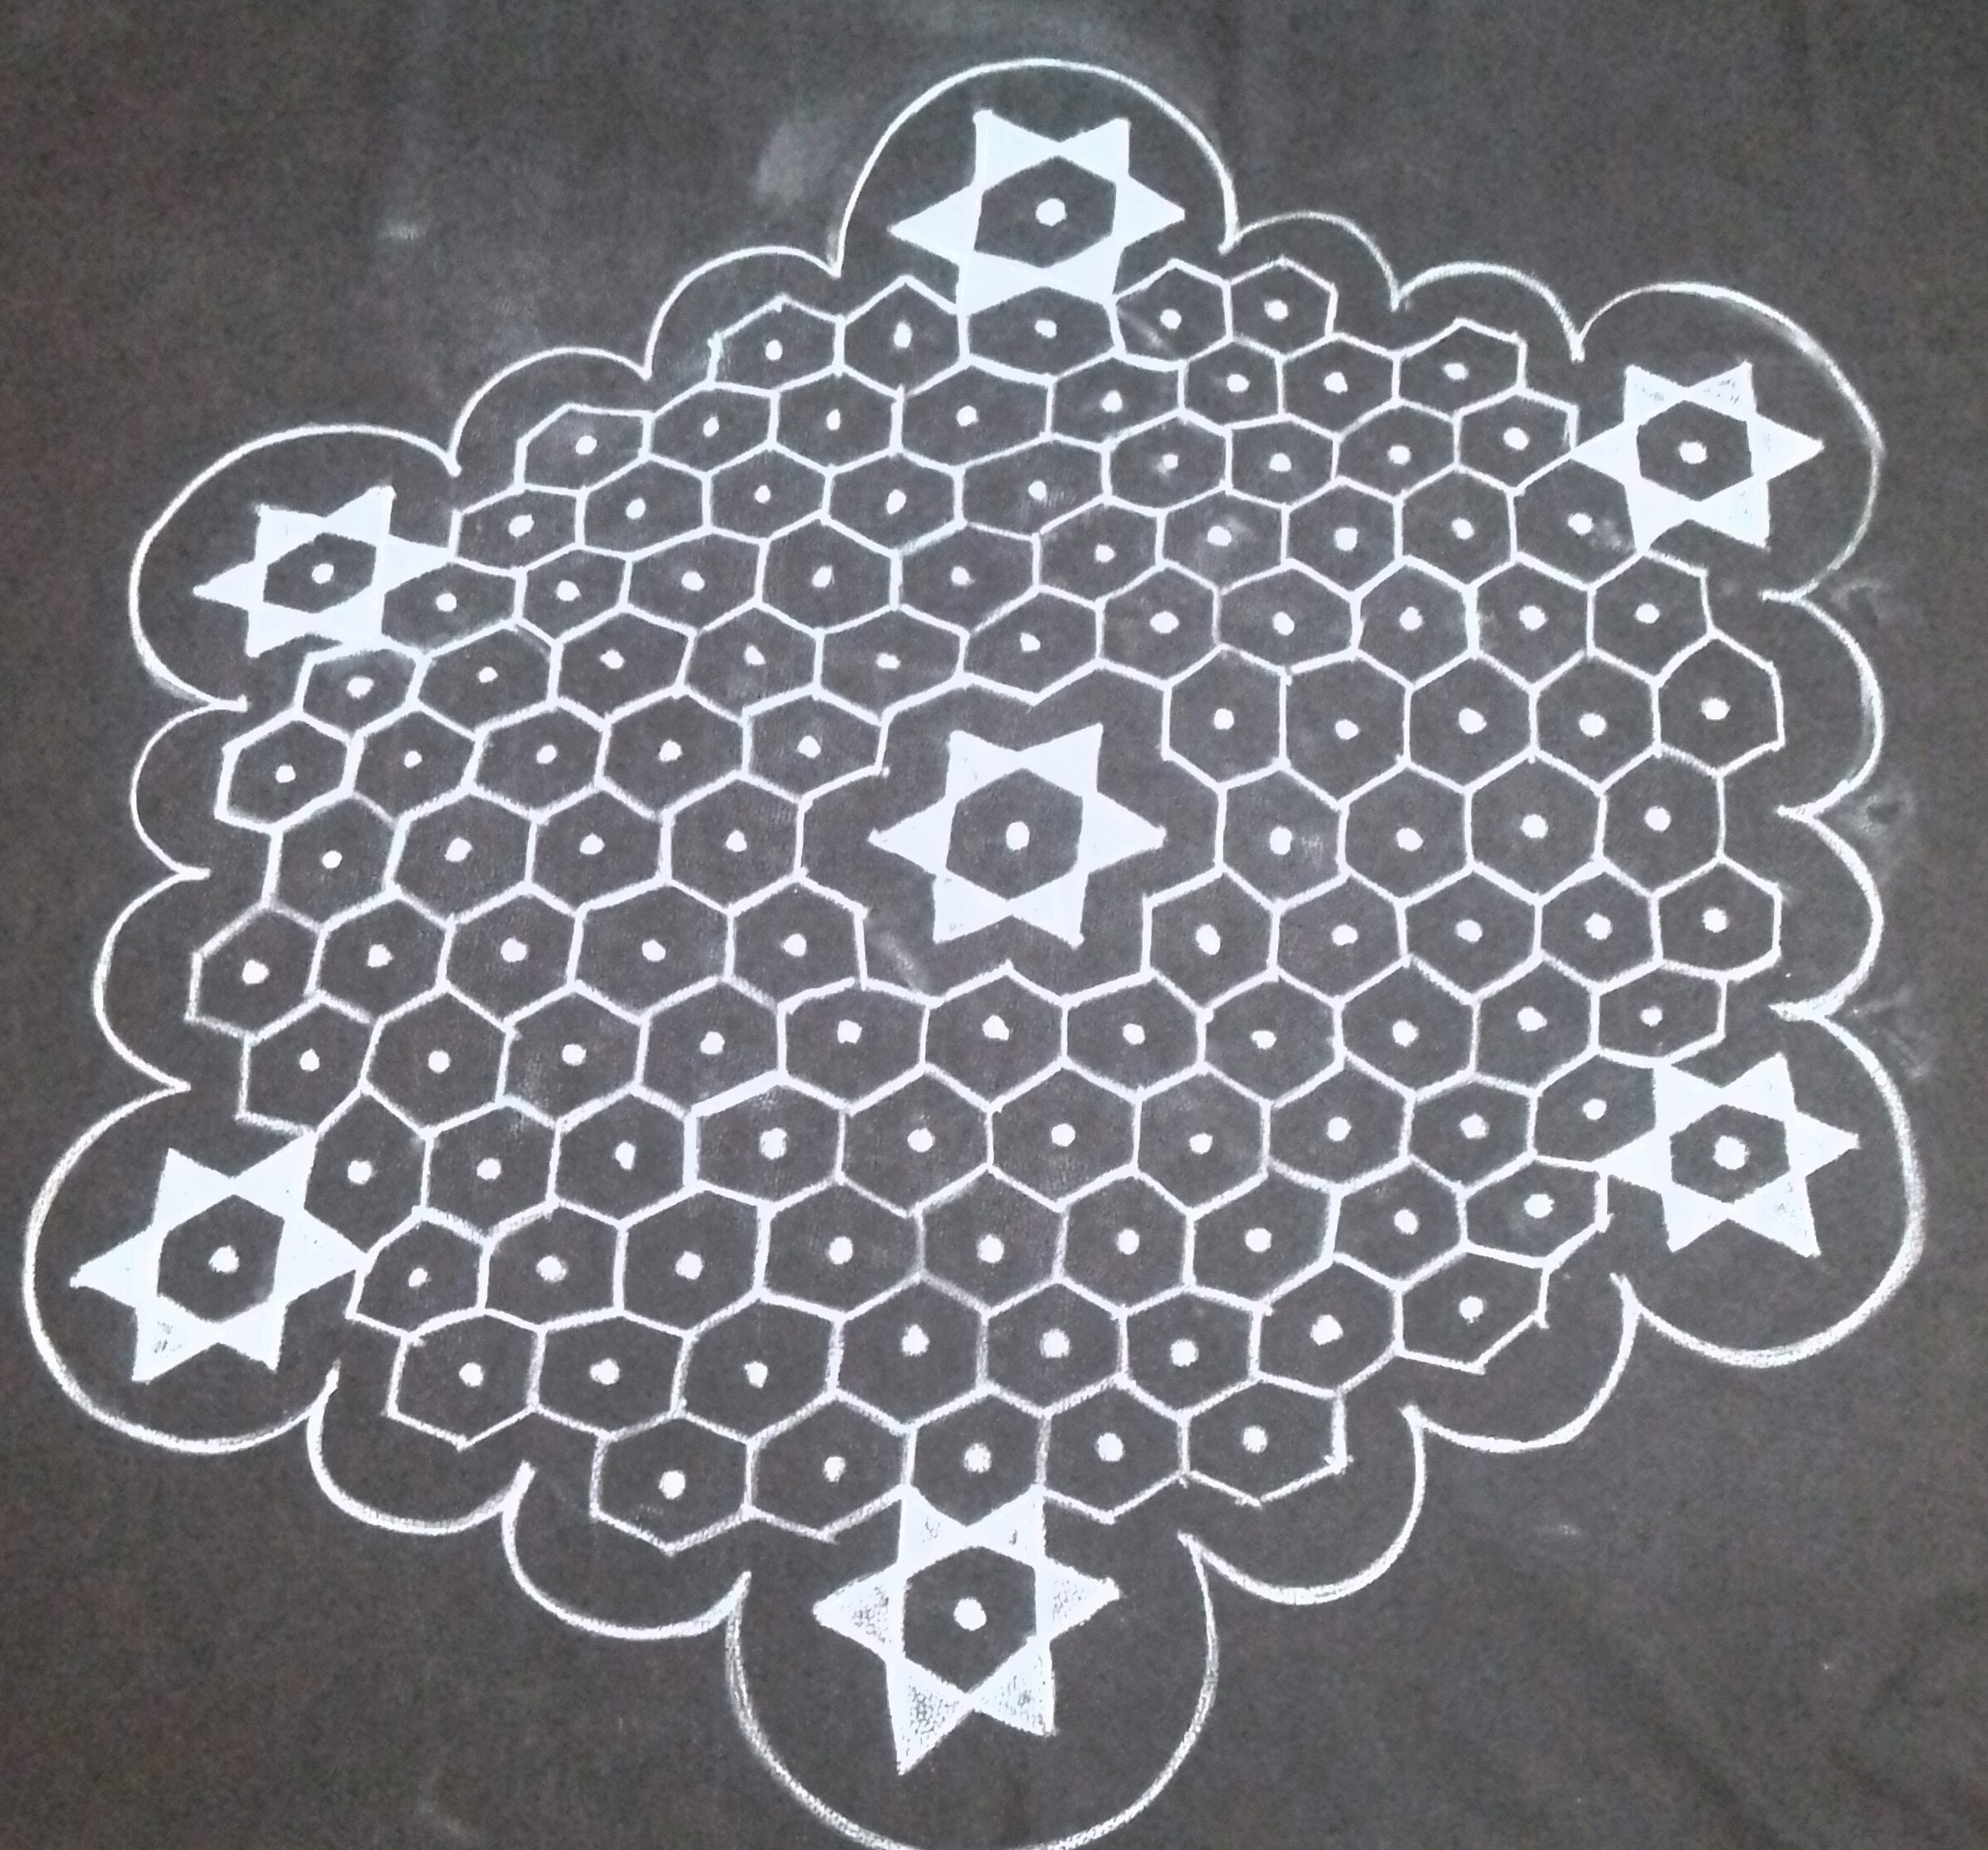 25 Dots Star Kolam    contest kolam